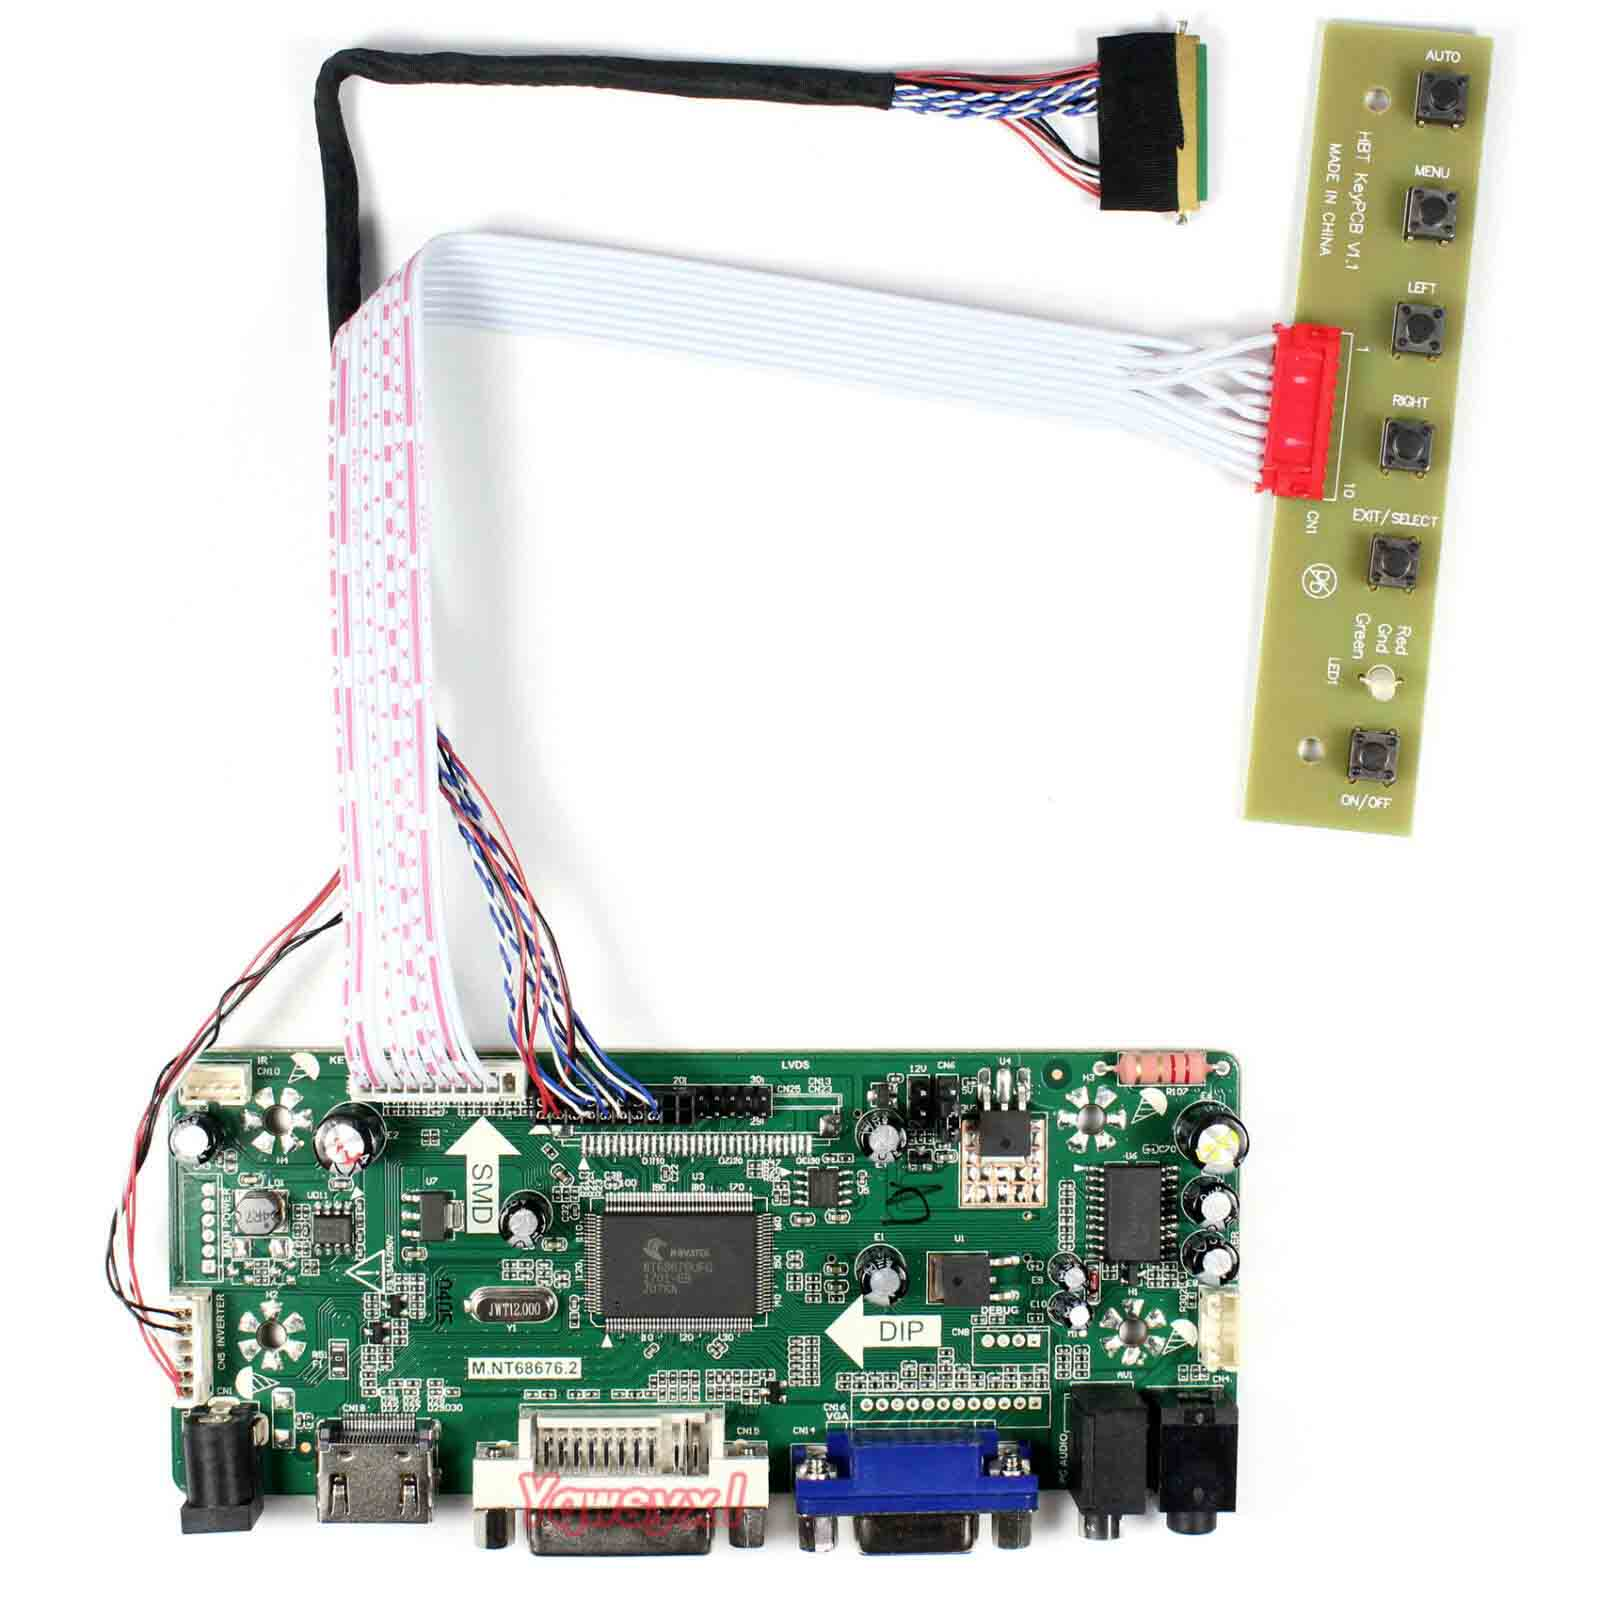 Yqwsyxl Control Board Monitor Kit For LTN173KT03-301 HDMI+DVI+VGA LCD LED Screen  Controller Board Driver